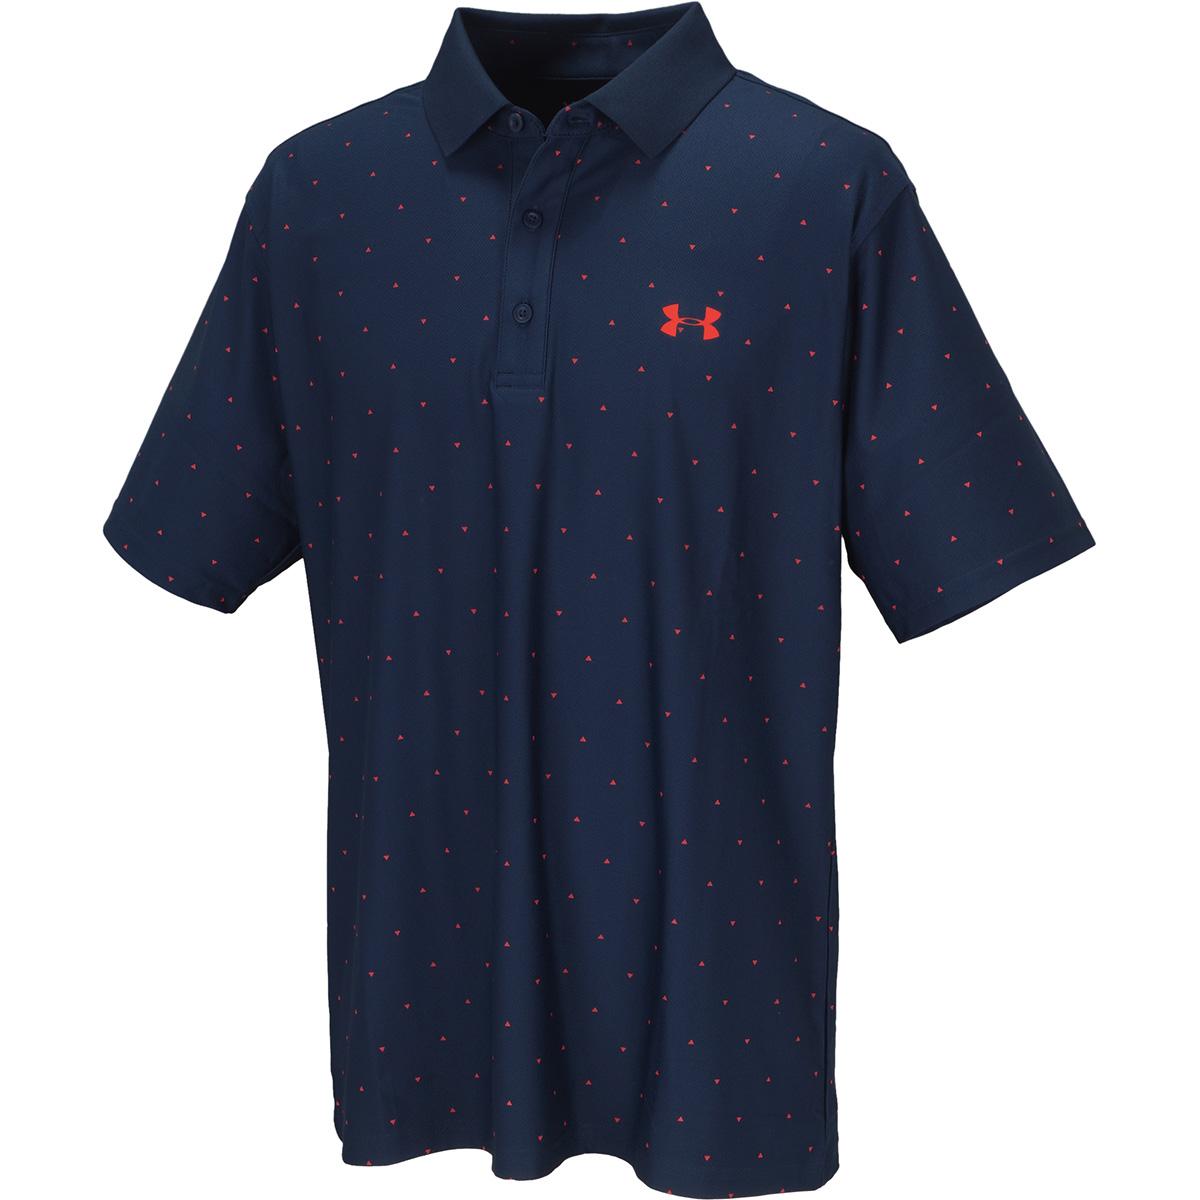 UA プレイオフ ピケ オールオーバープリント半袖ポロシャツ